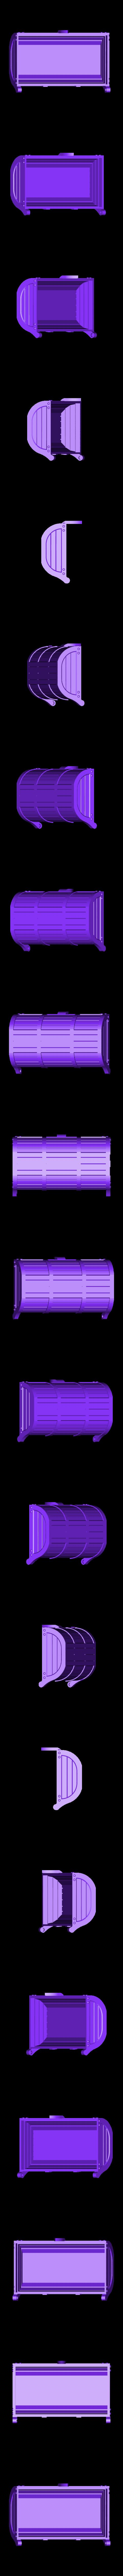 TicTacToe_Treasure_Chest_Top.STL Télécharger fichier STL gratuit Treasure Tic Tac Toe • Plan à imprimer en 3D, JonathanK1906